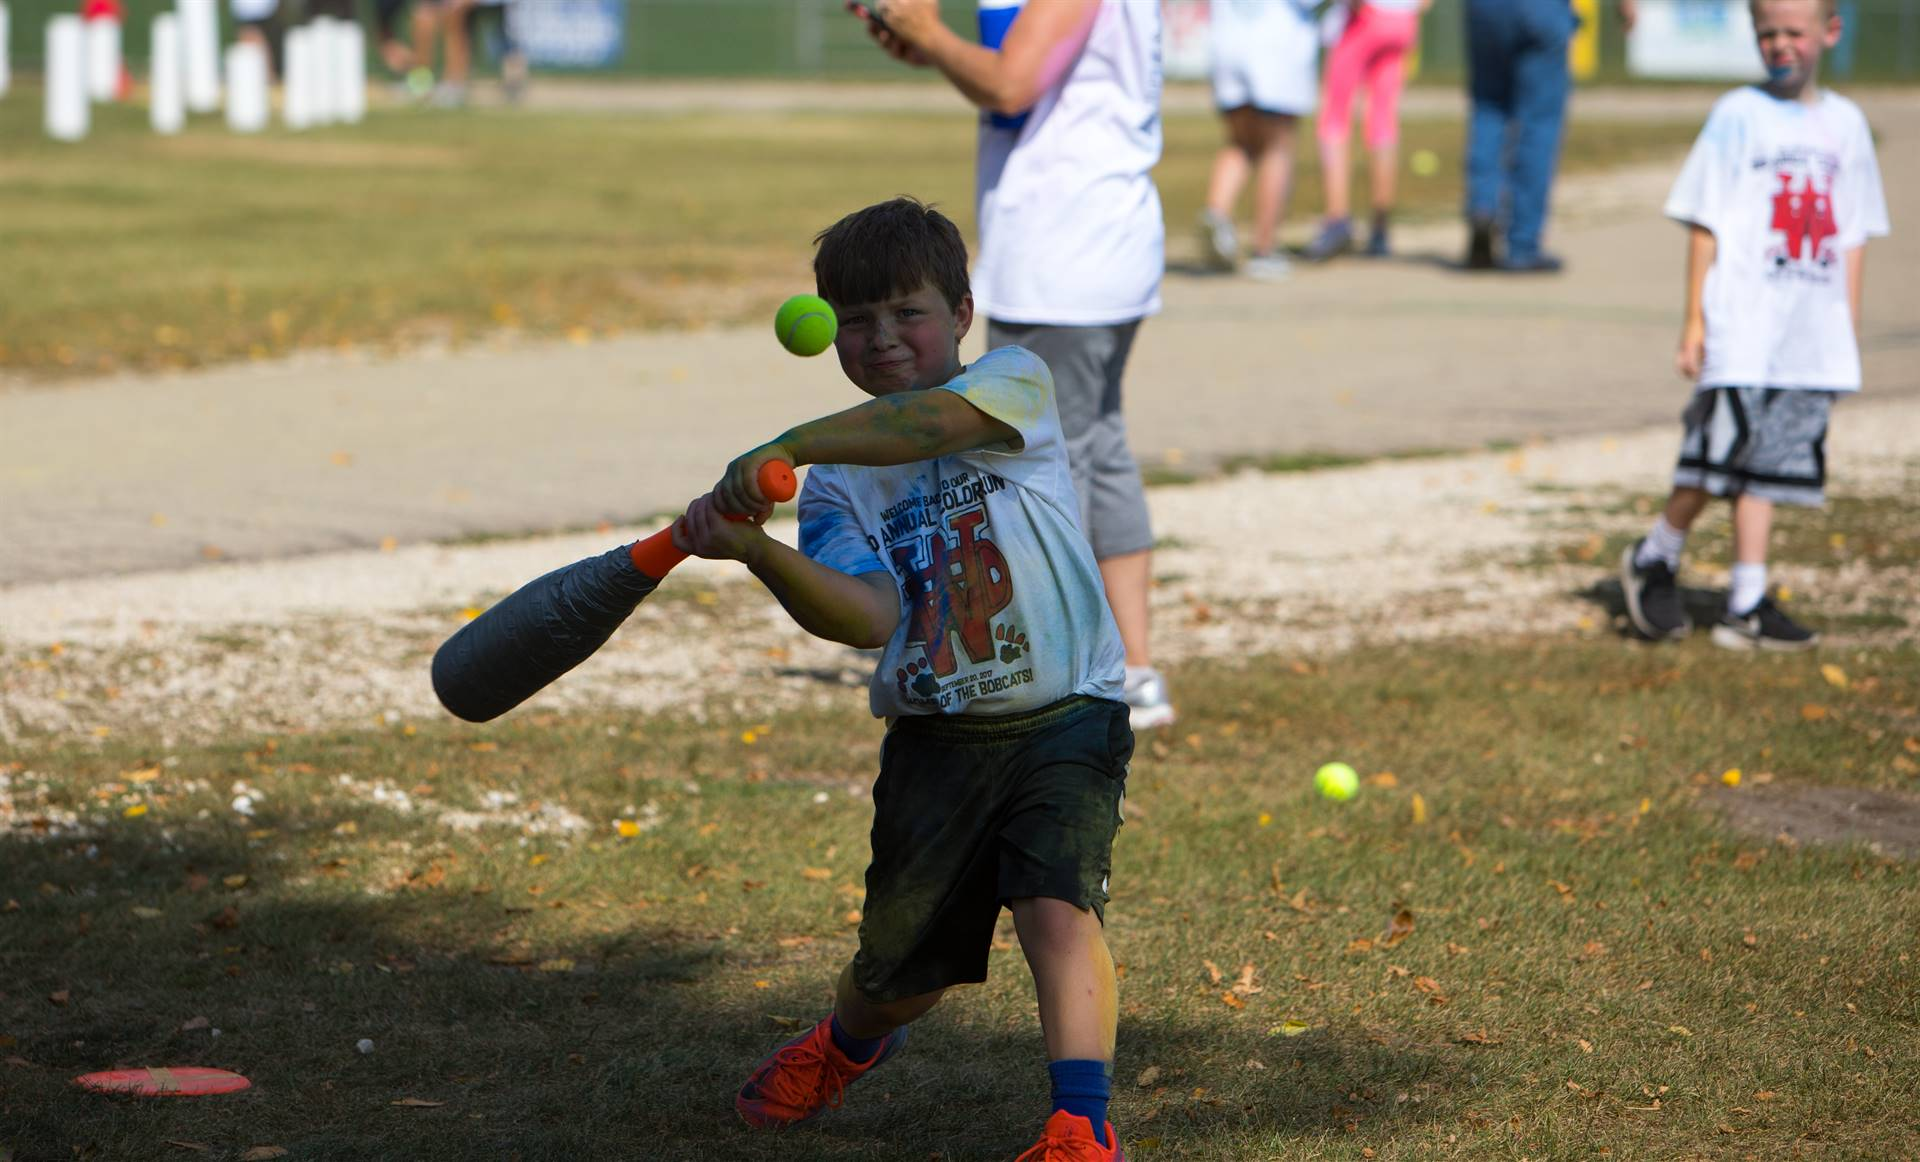 boy hitting ball 5